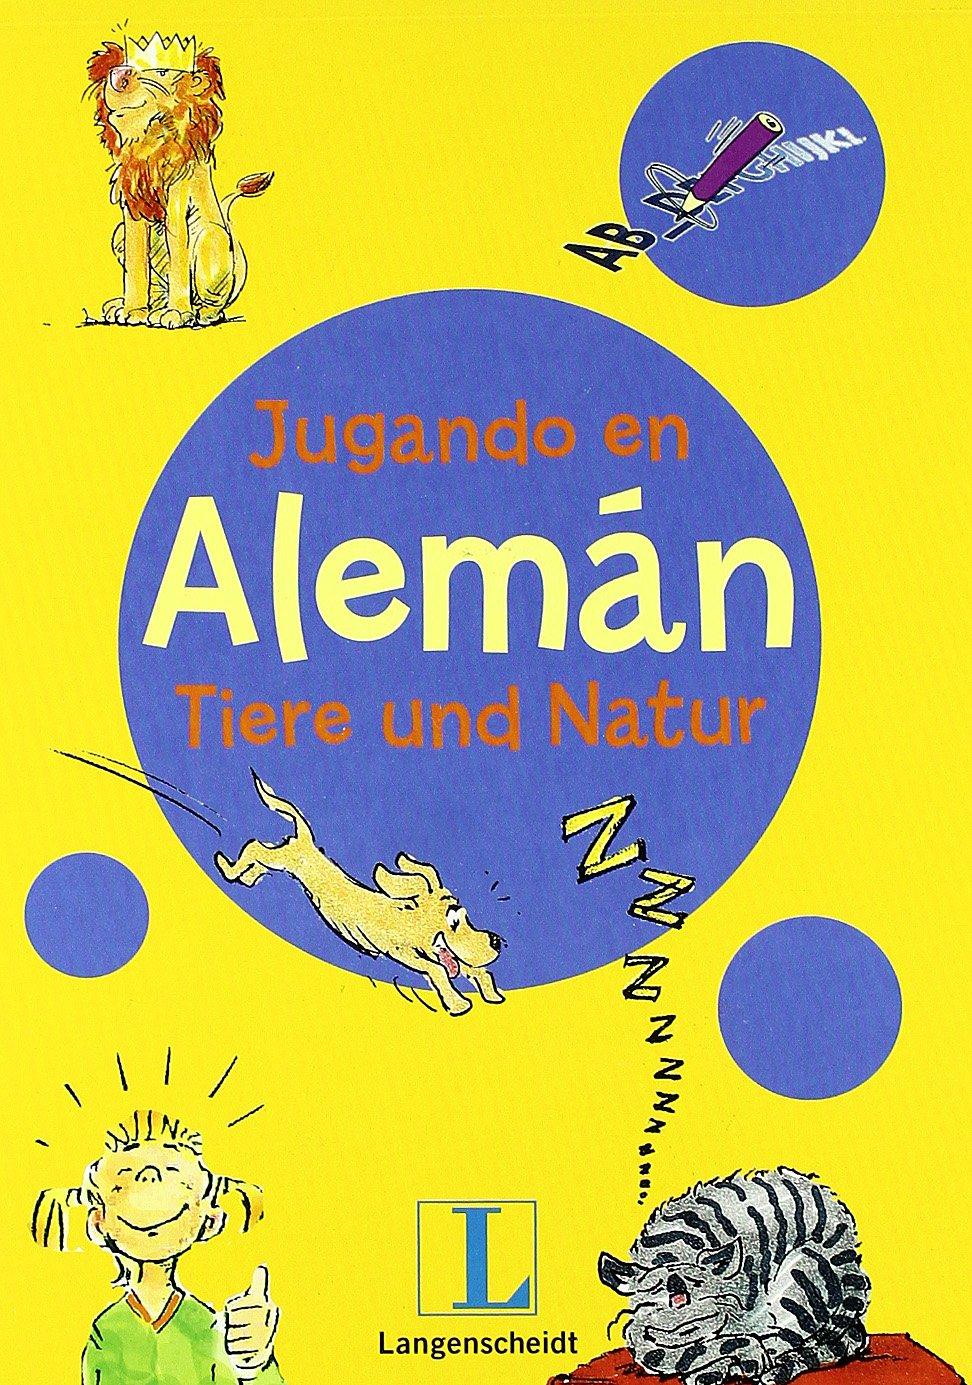 Jugando en alemán Tiere und Natur Tapa blanda – 7 jun 2011 Aa.Vv. Langenscheidt 8499298206 1849321